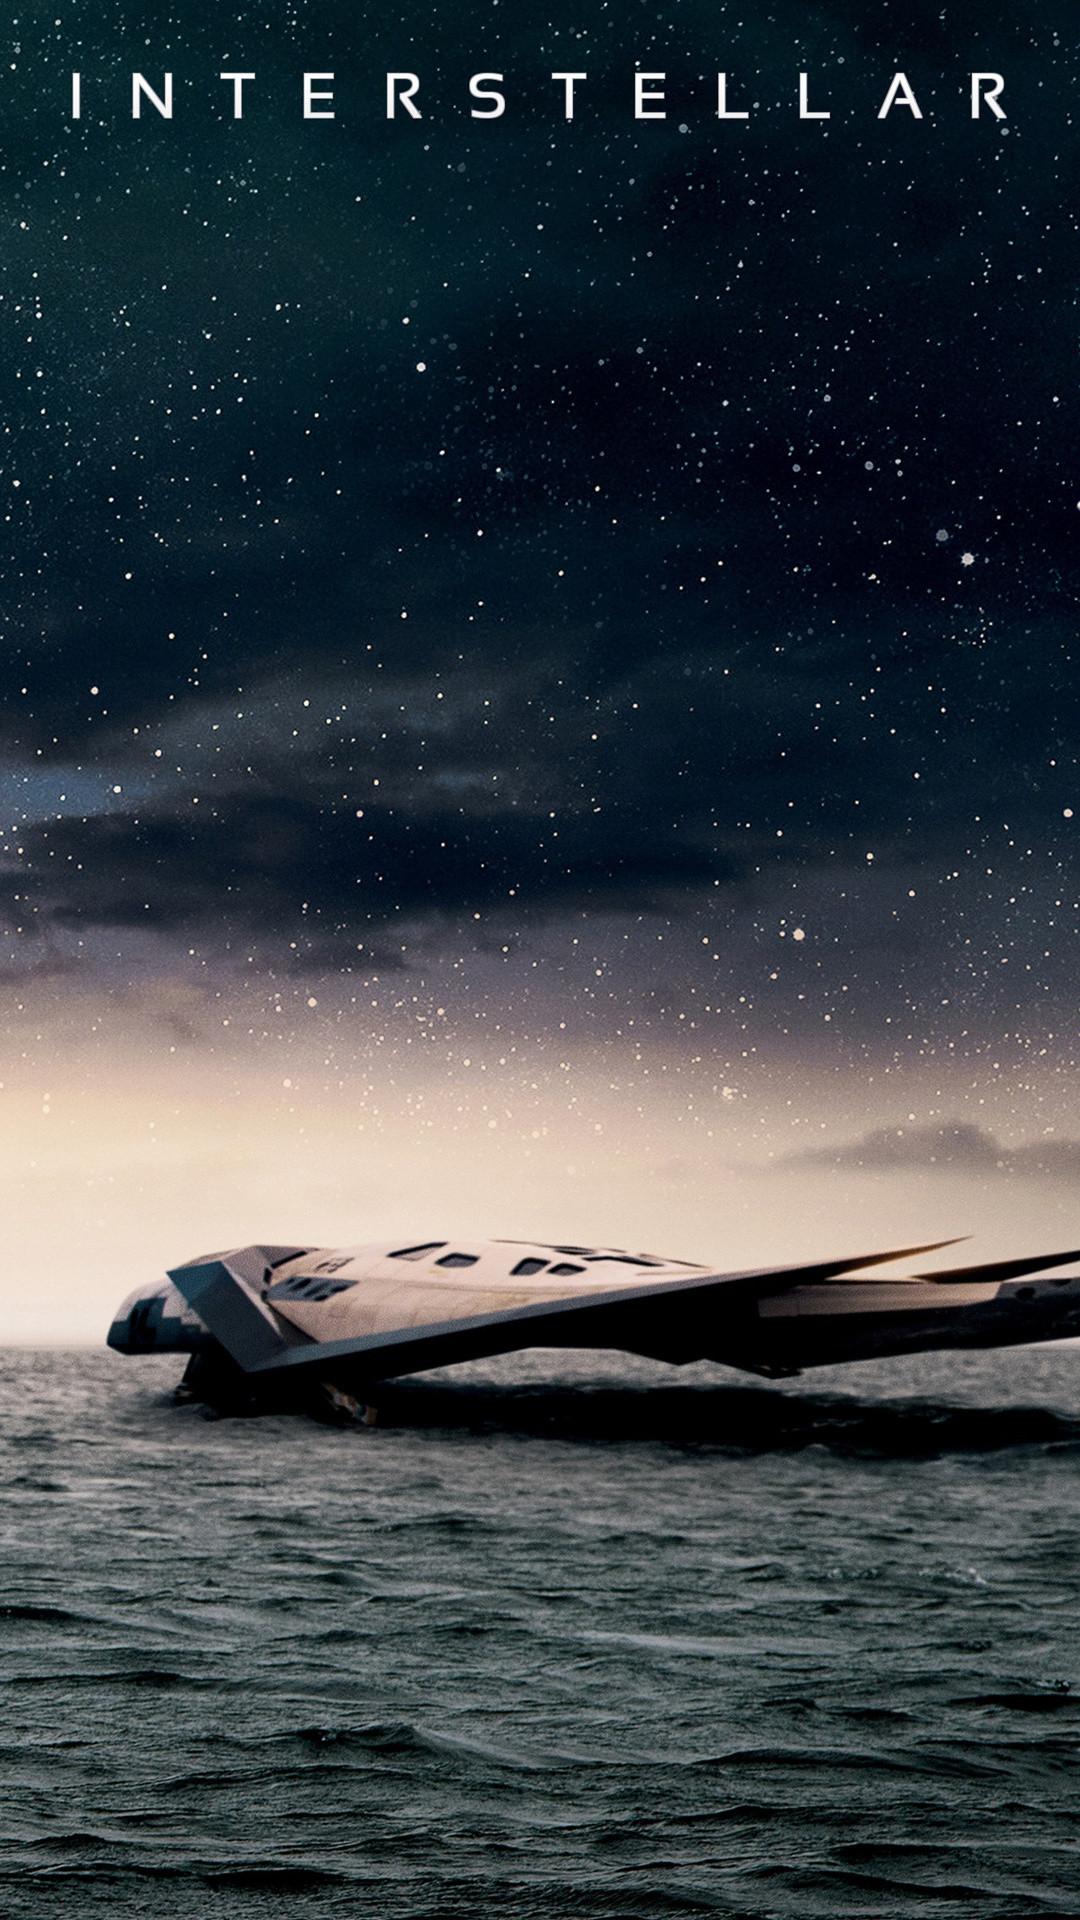 Interstellar The Movie Mobile HD Wallpaper